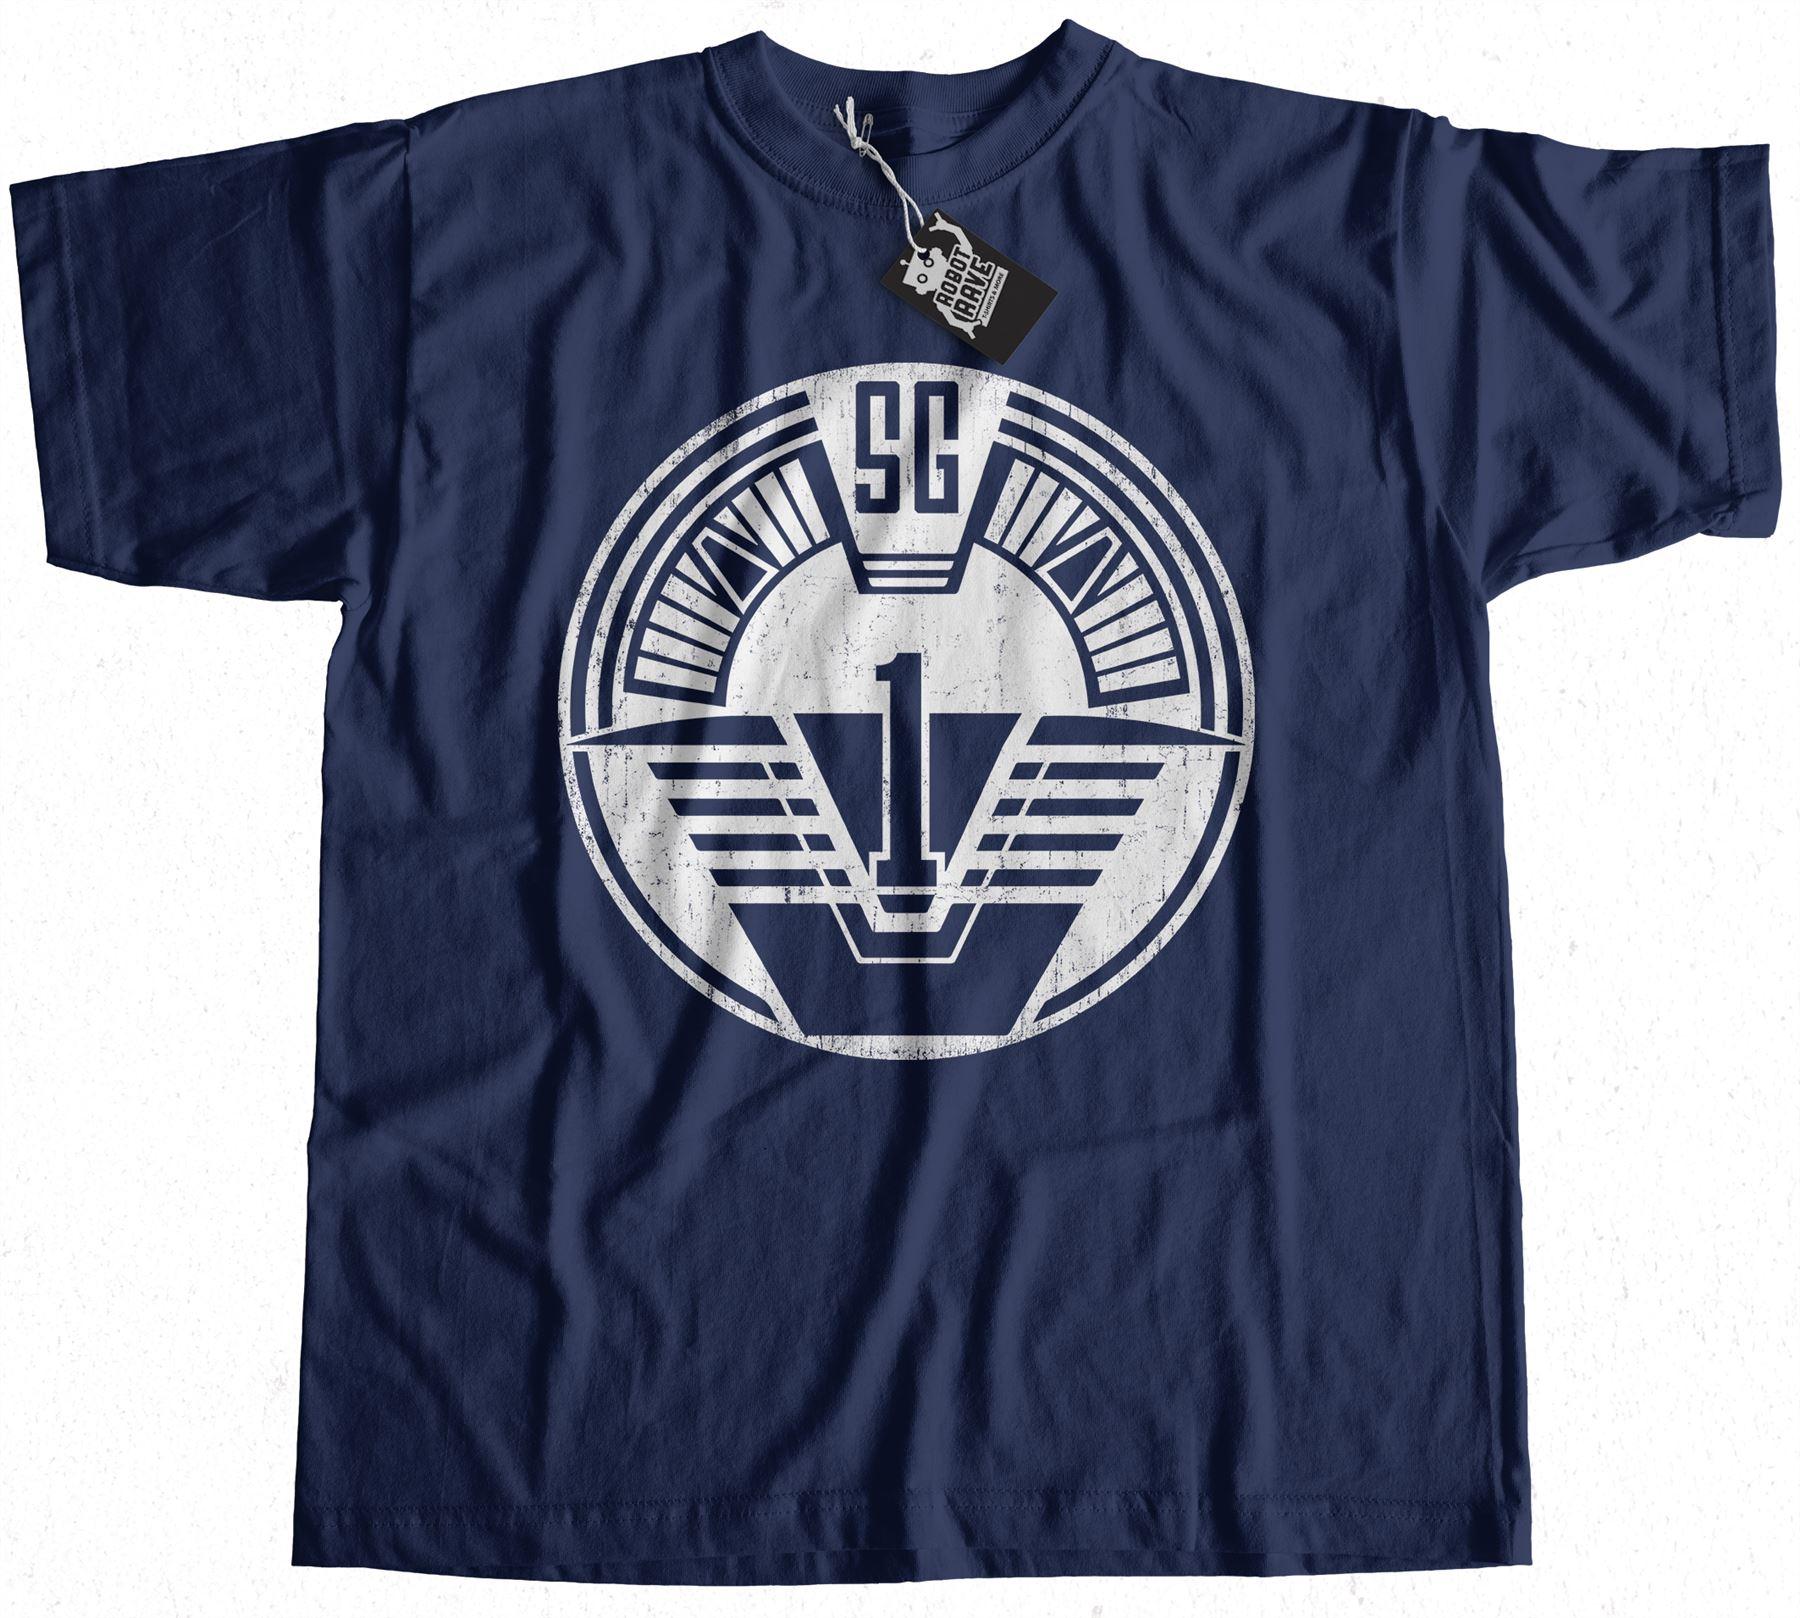 SG1-T-Shirt-100-Premium-Cotton Indexbild 17